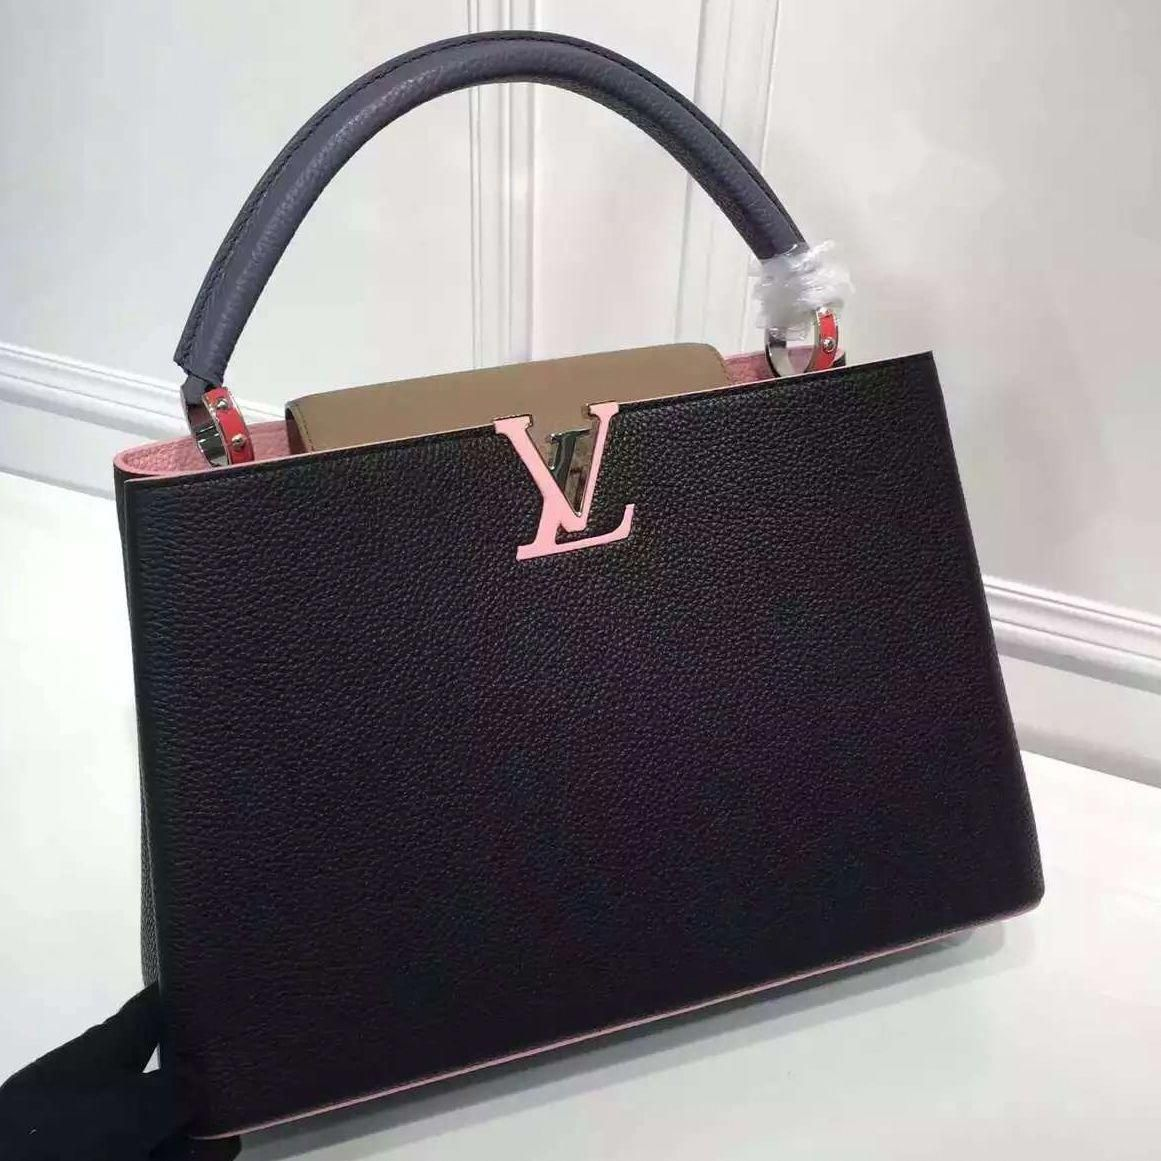 Louis Vuitton Grained Calfskin Multicolor Capucines MM Bag Black Pink   Louisvuittonhandbags 965eccd77b